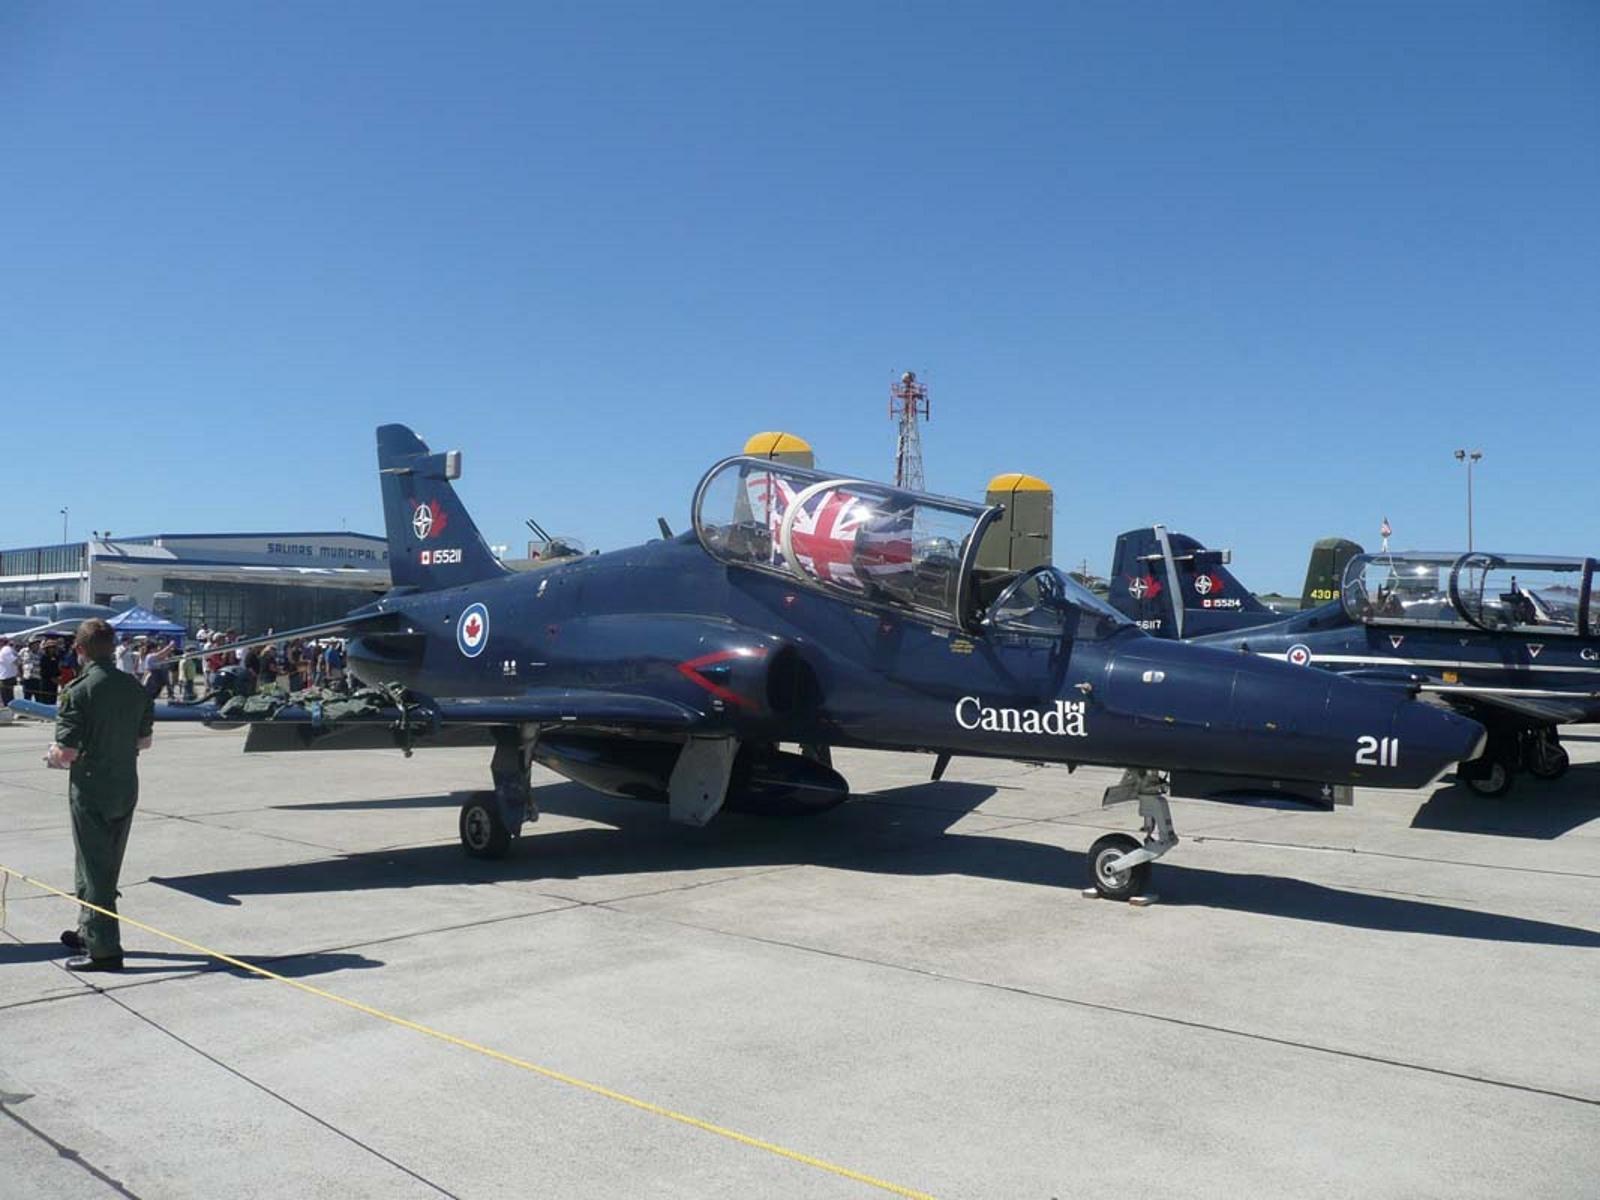 BAE CT-155 Hawk